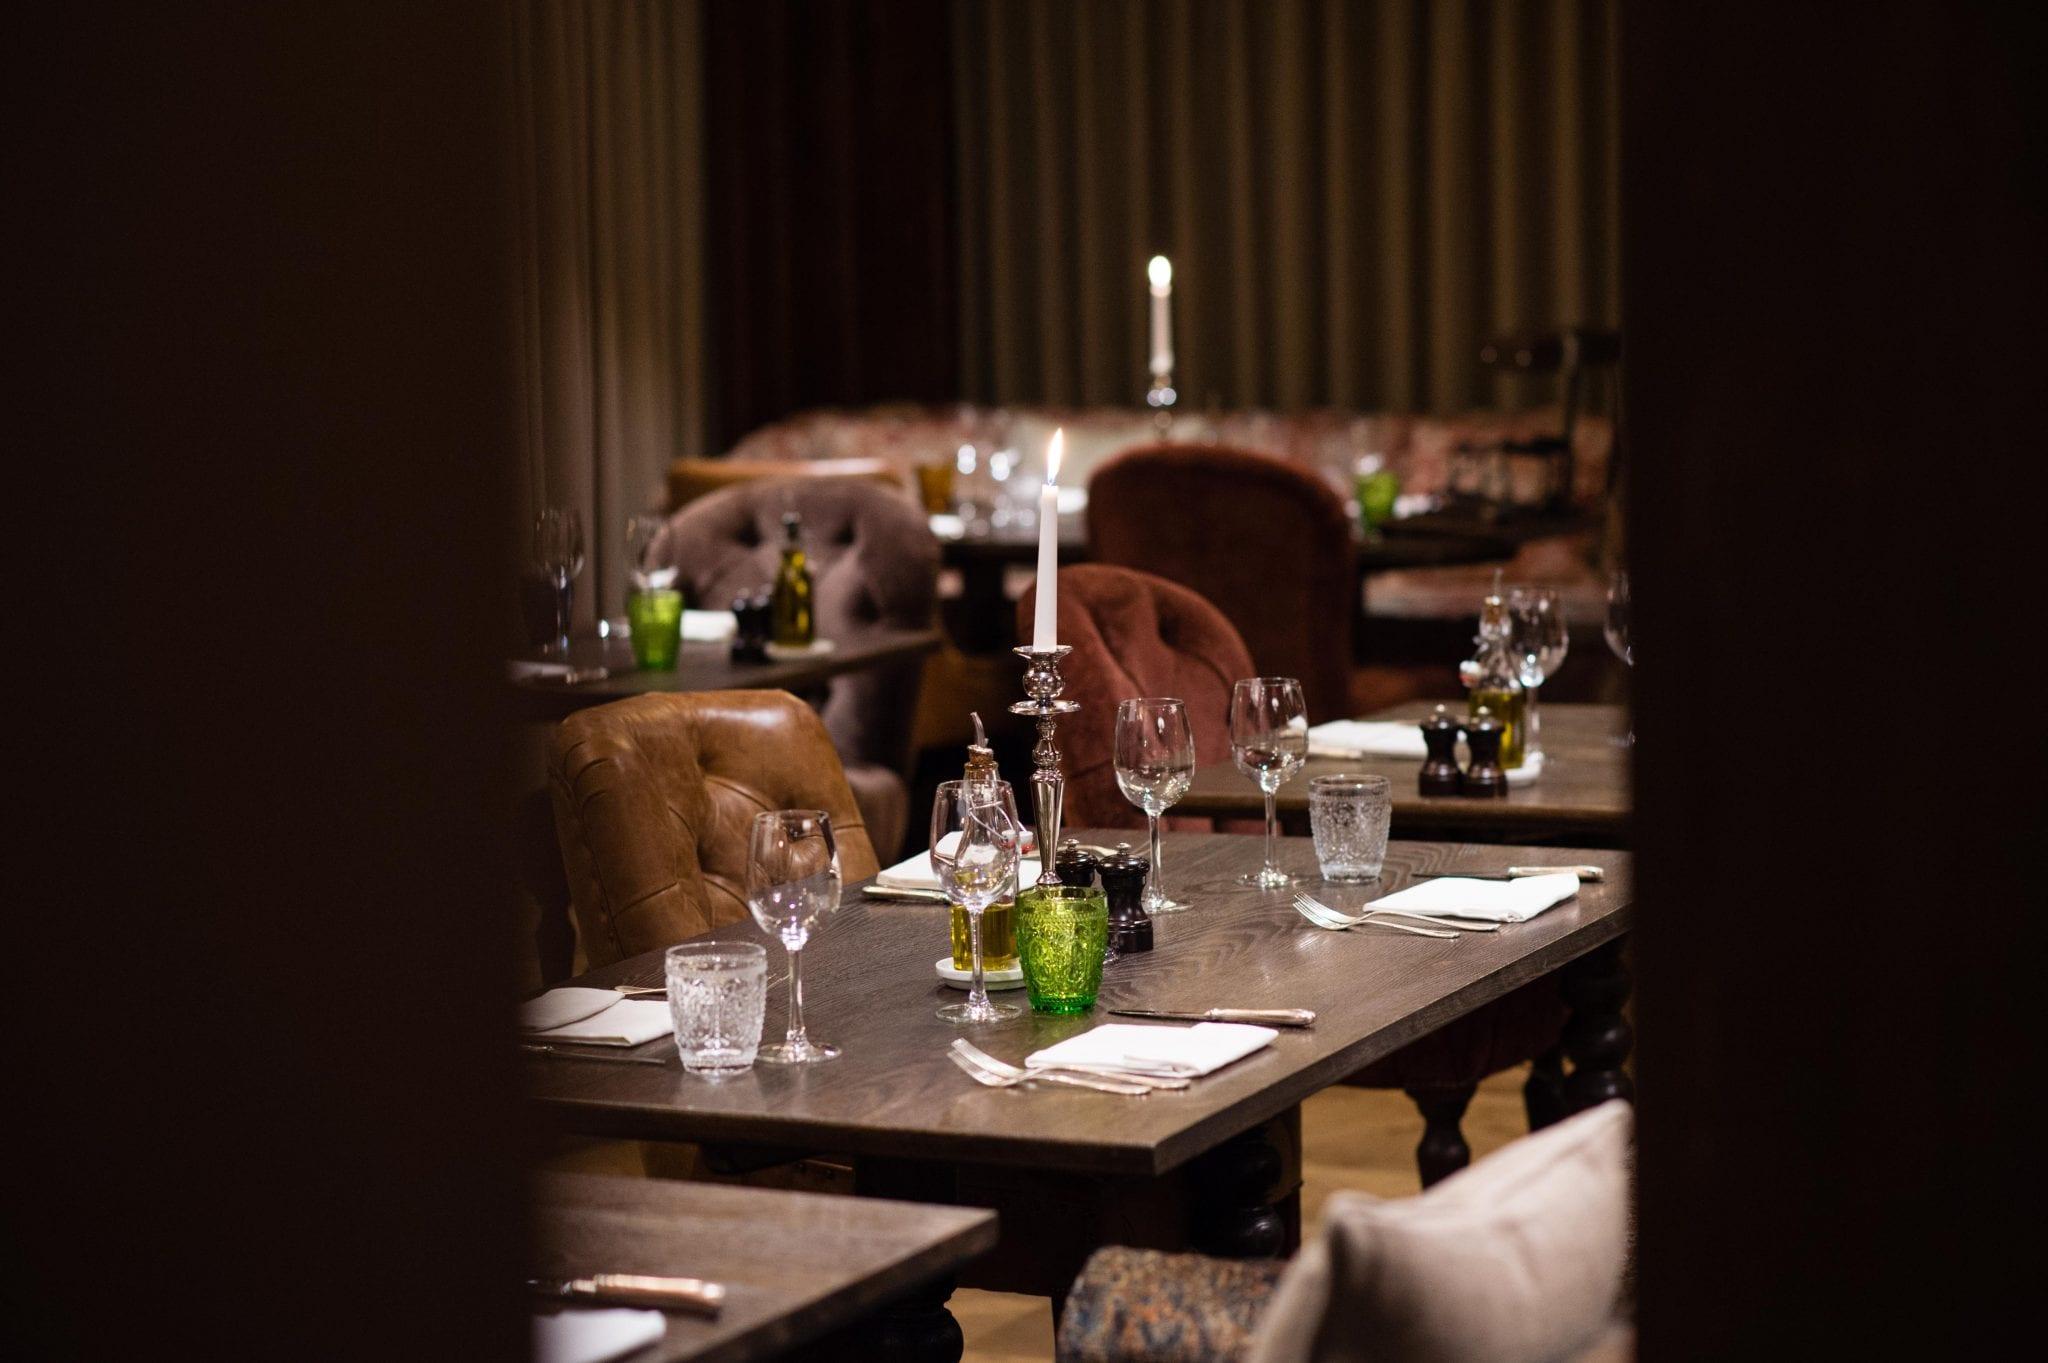 cucina-angelina-restaurant-amy-murrell-2